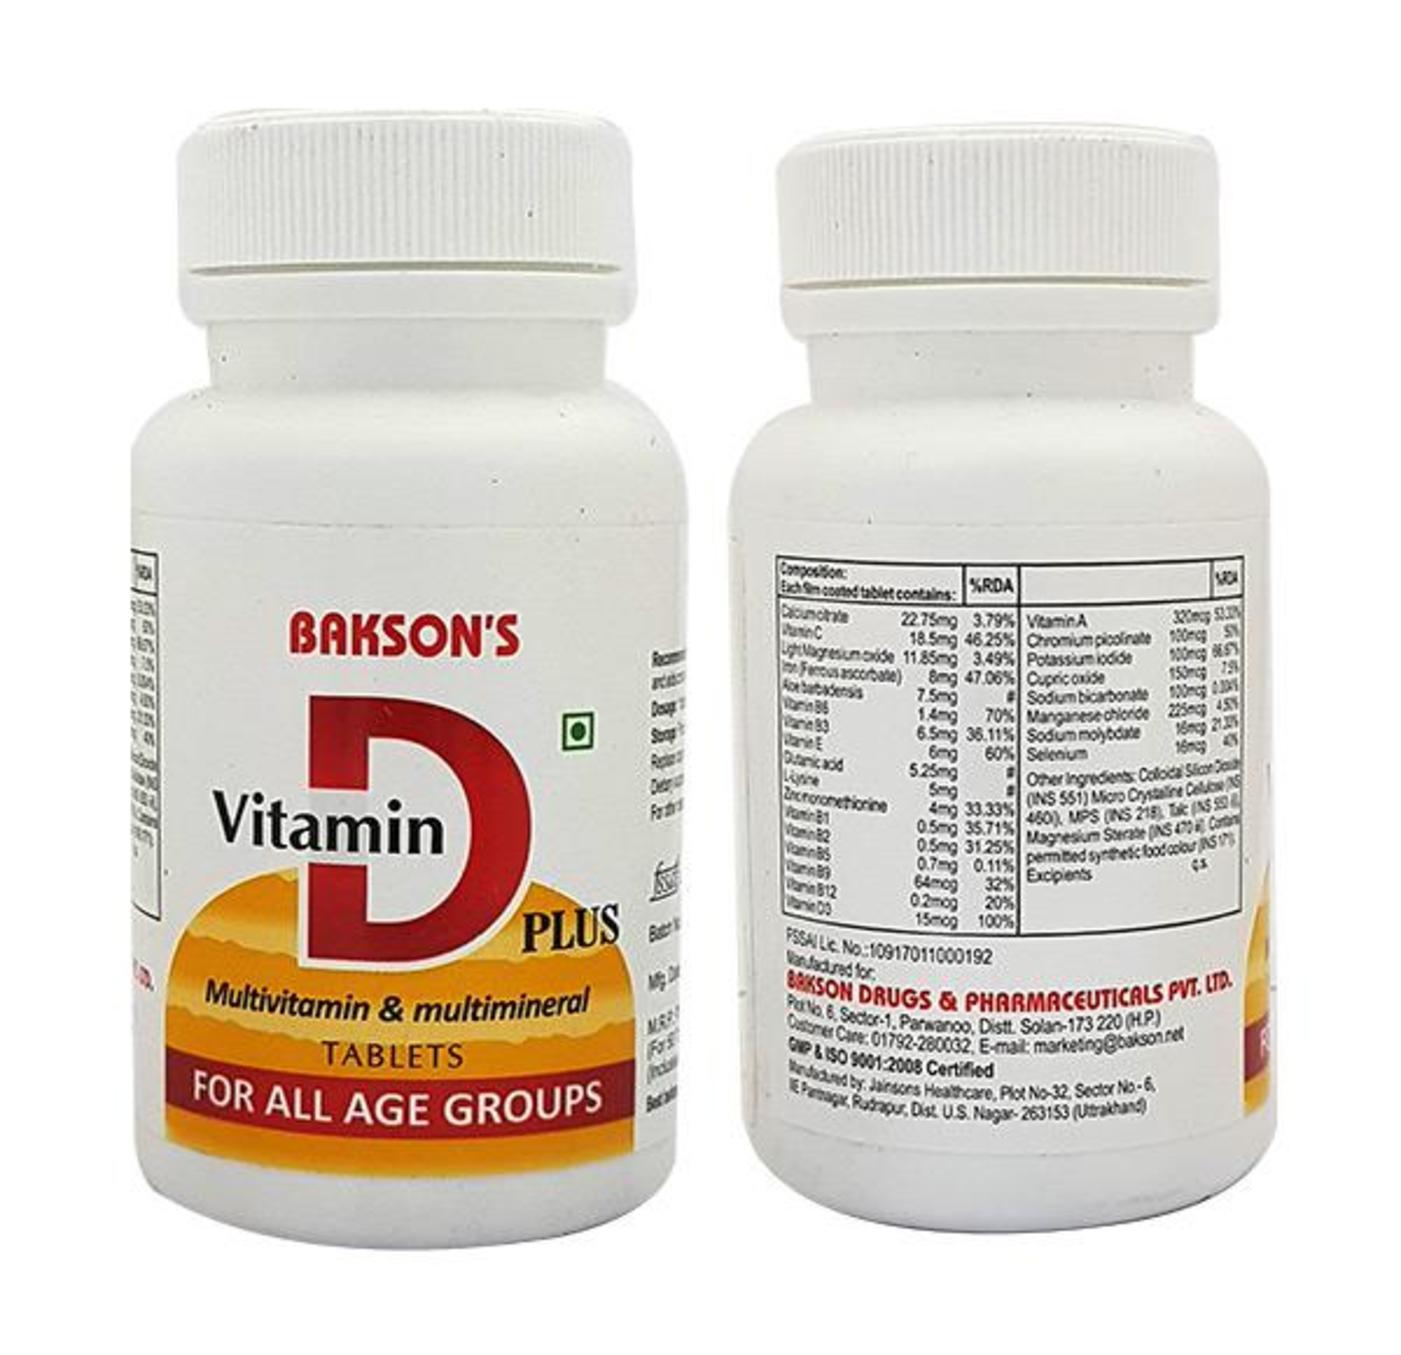 Bakson Vitamin D Plus Tablet Homeopathic Medicine style=